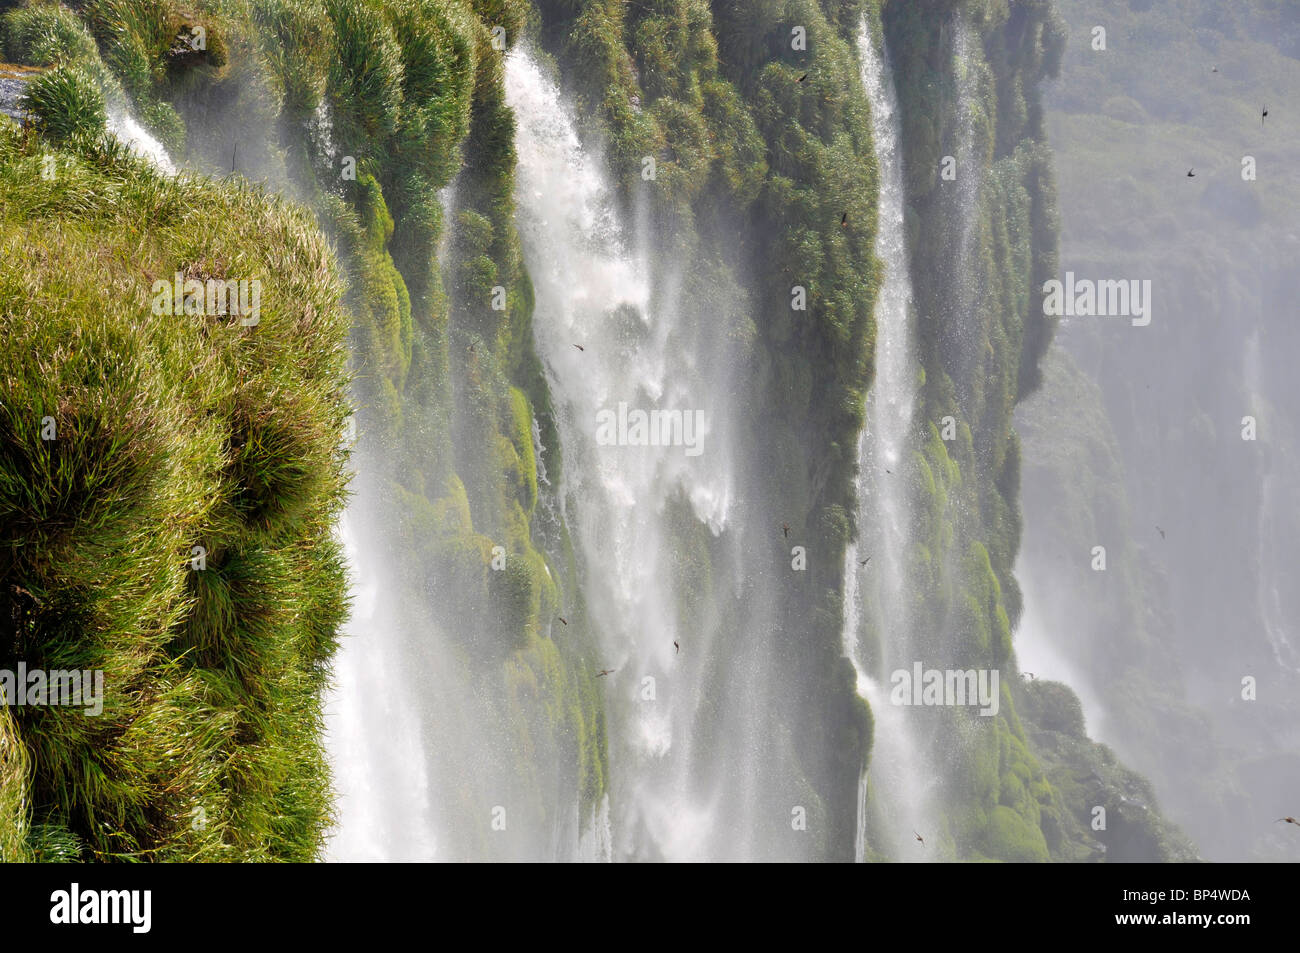 Falls next to Devil's throat, Iguassu or Iguazu falls National Park, Argentina - Stock Image